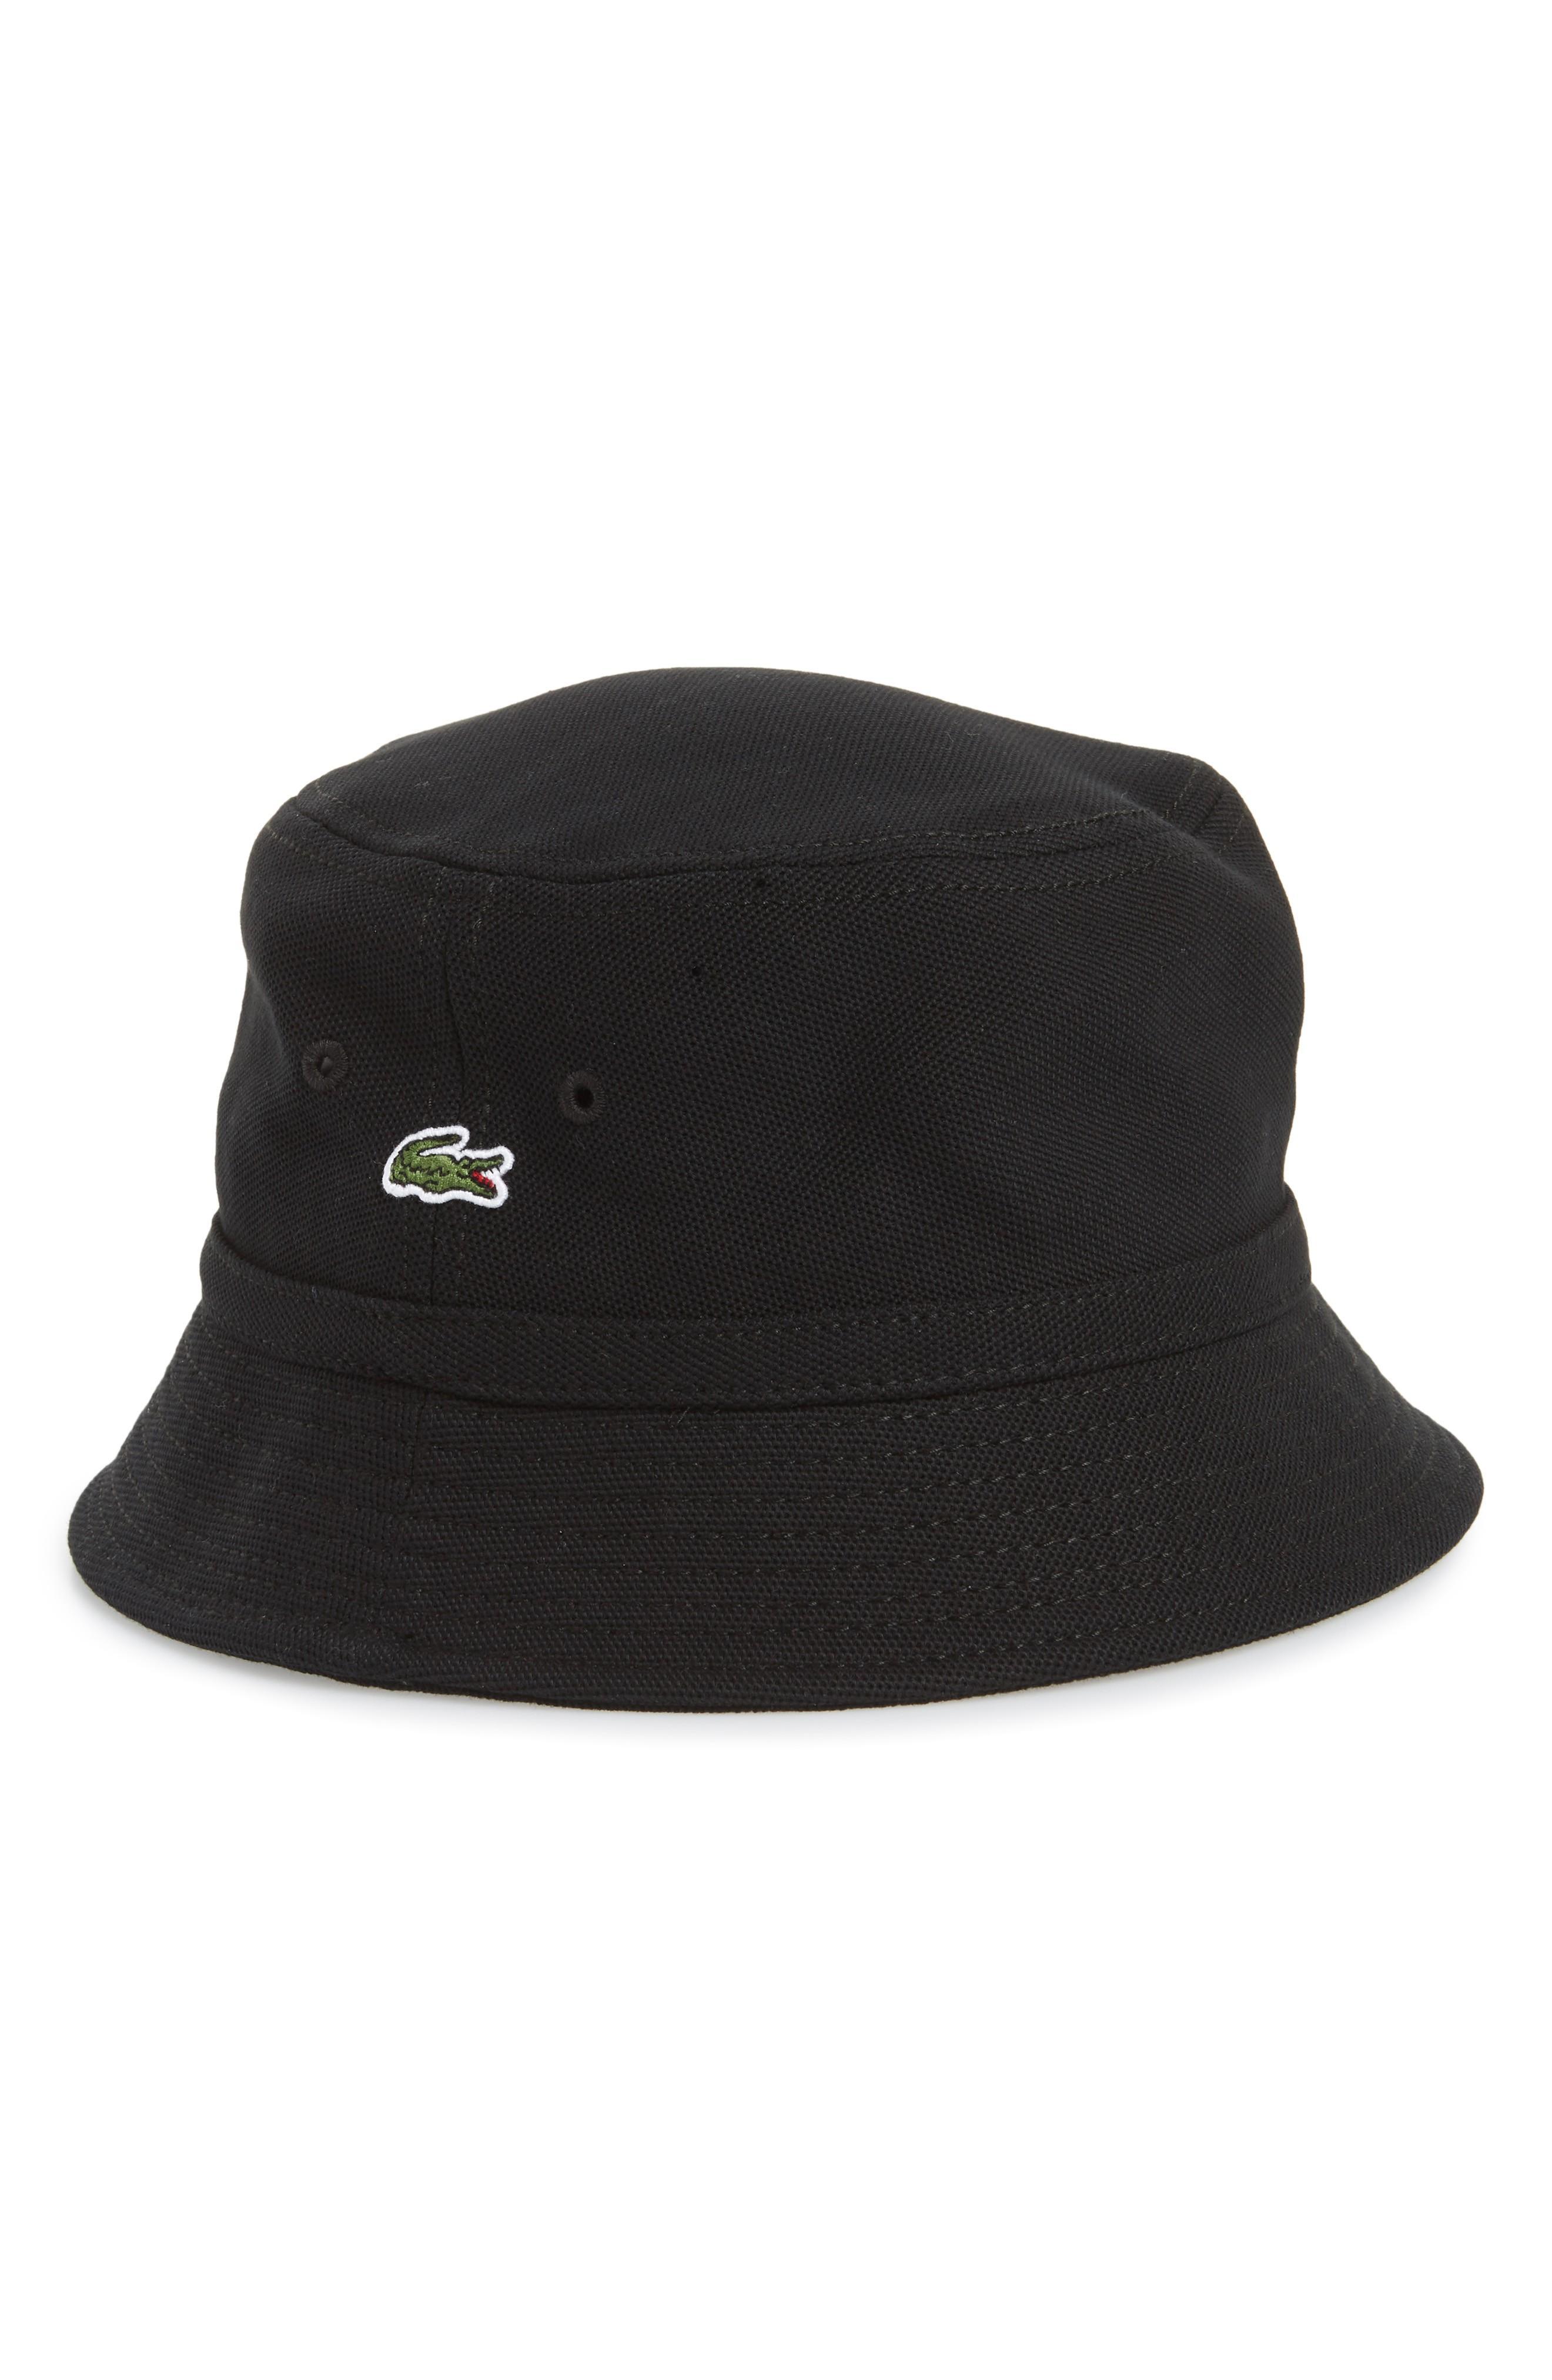 Lacoste Bob Bucket Hat - White  c7ccae2249d6